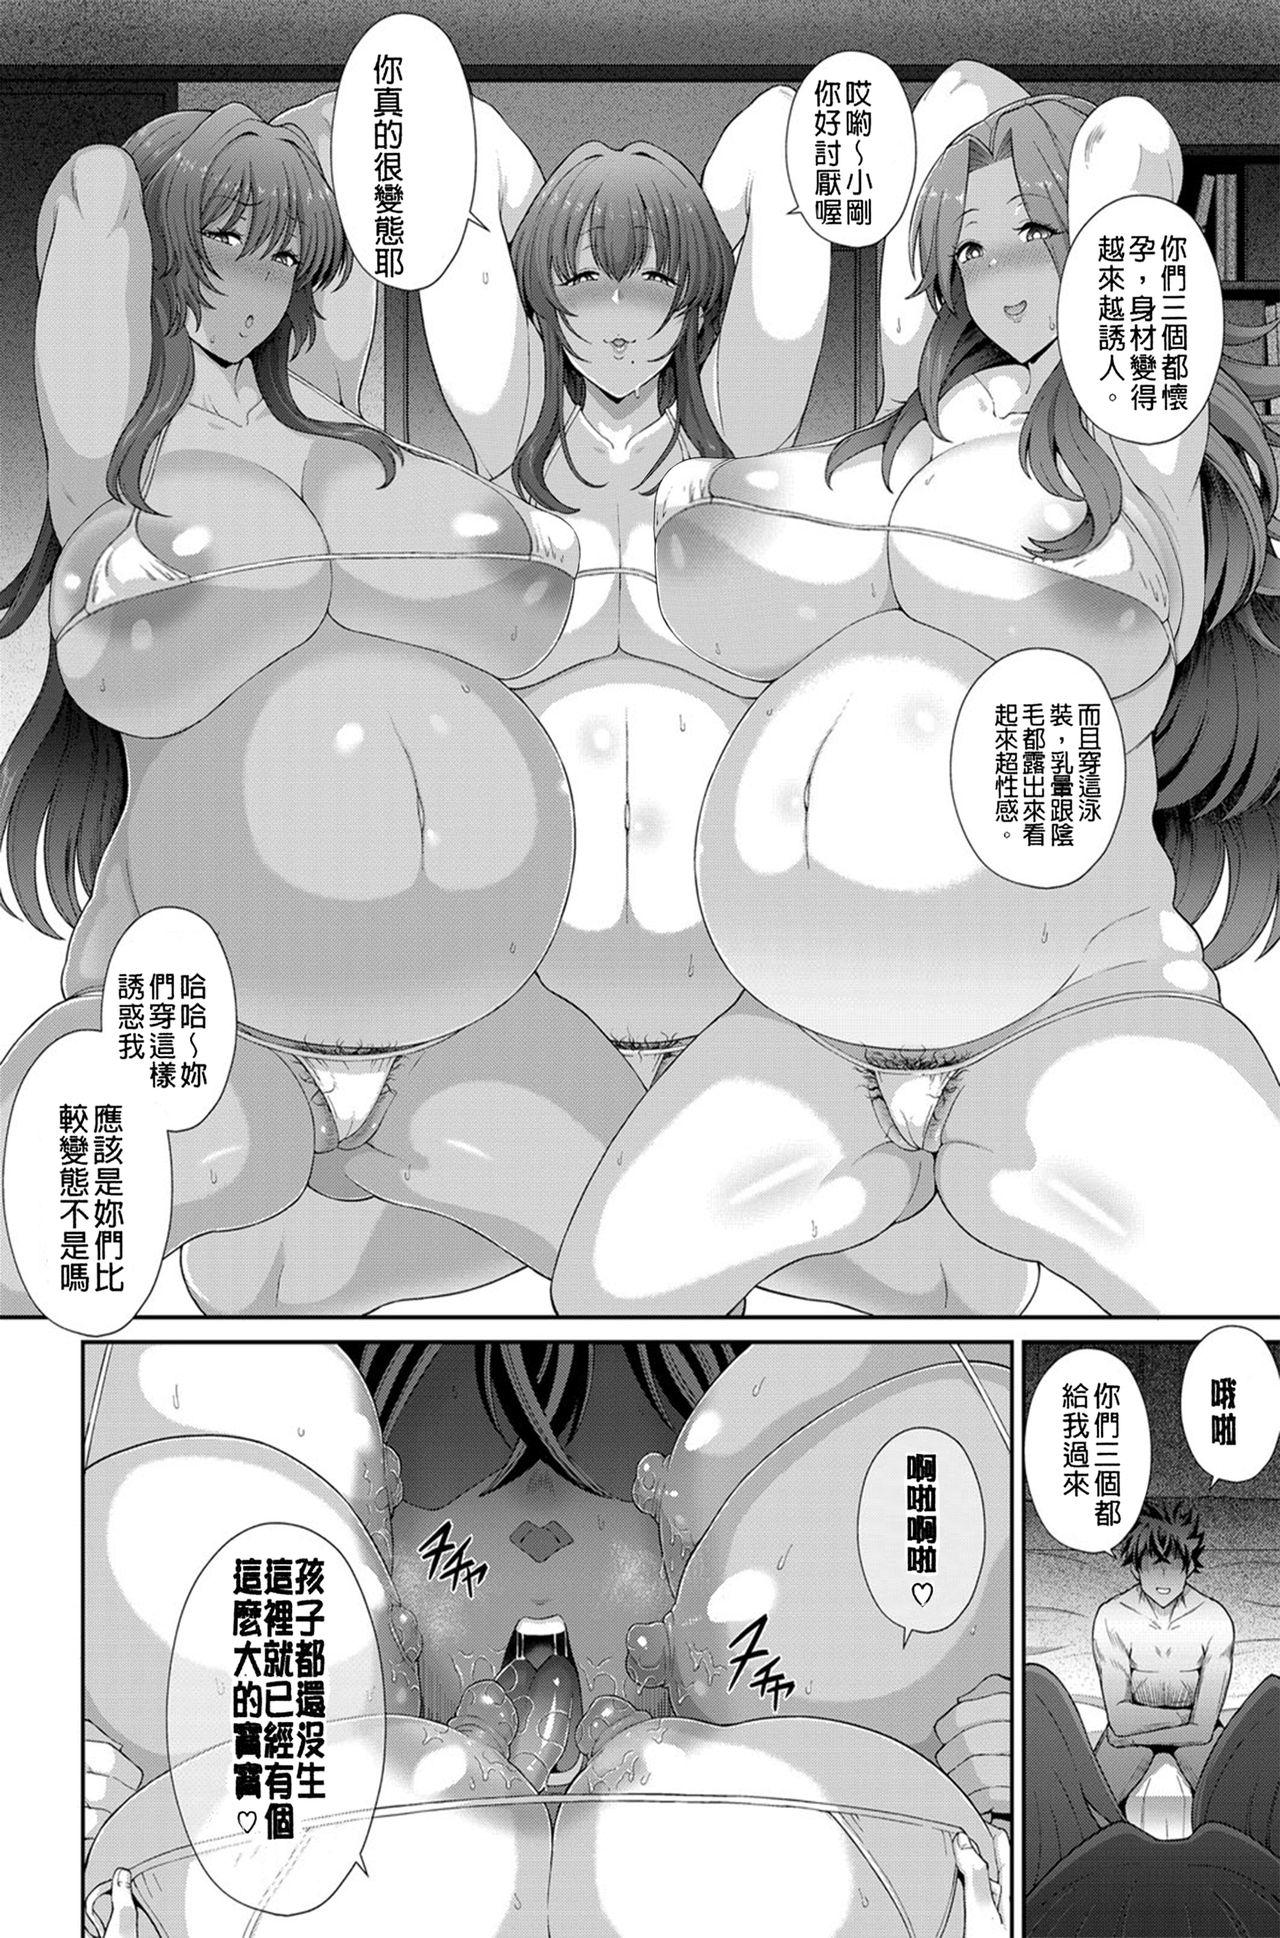 Juku Mesu - Erotic Mature Women 98